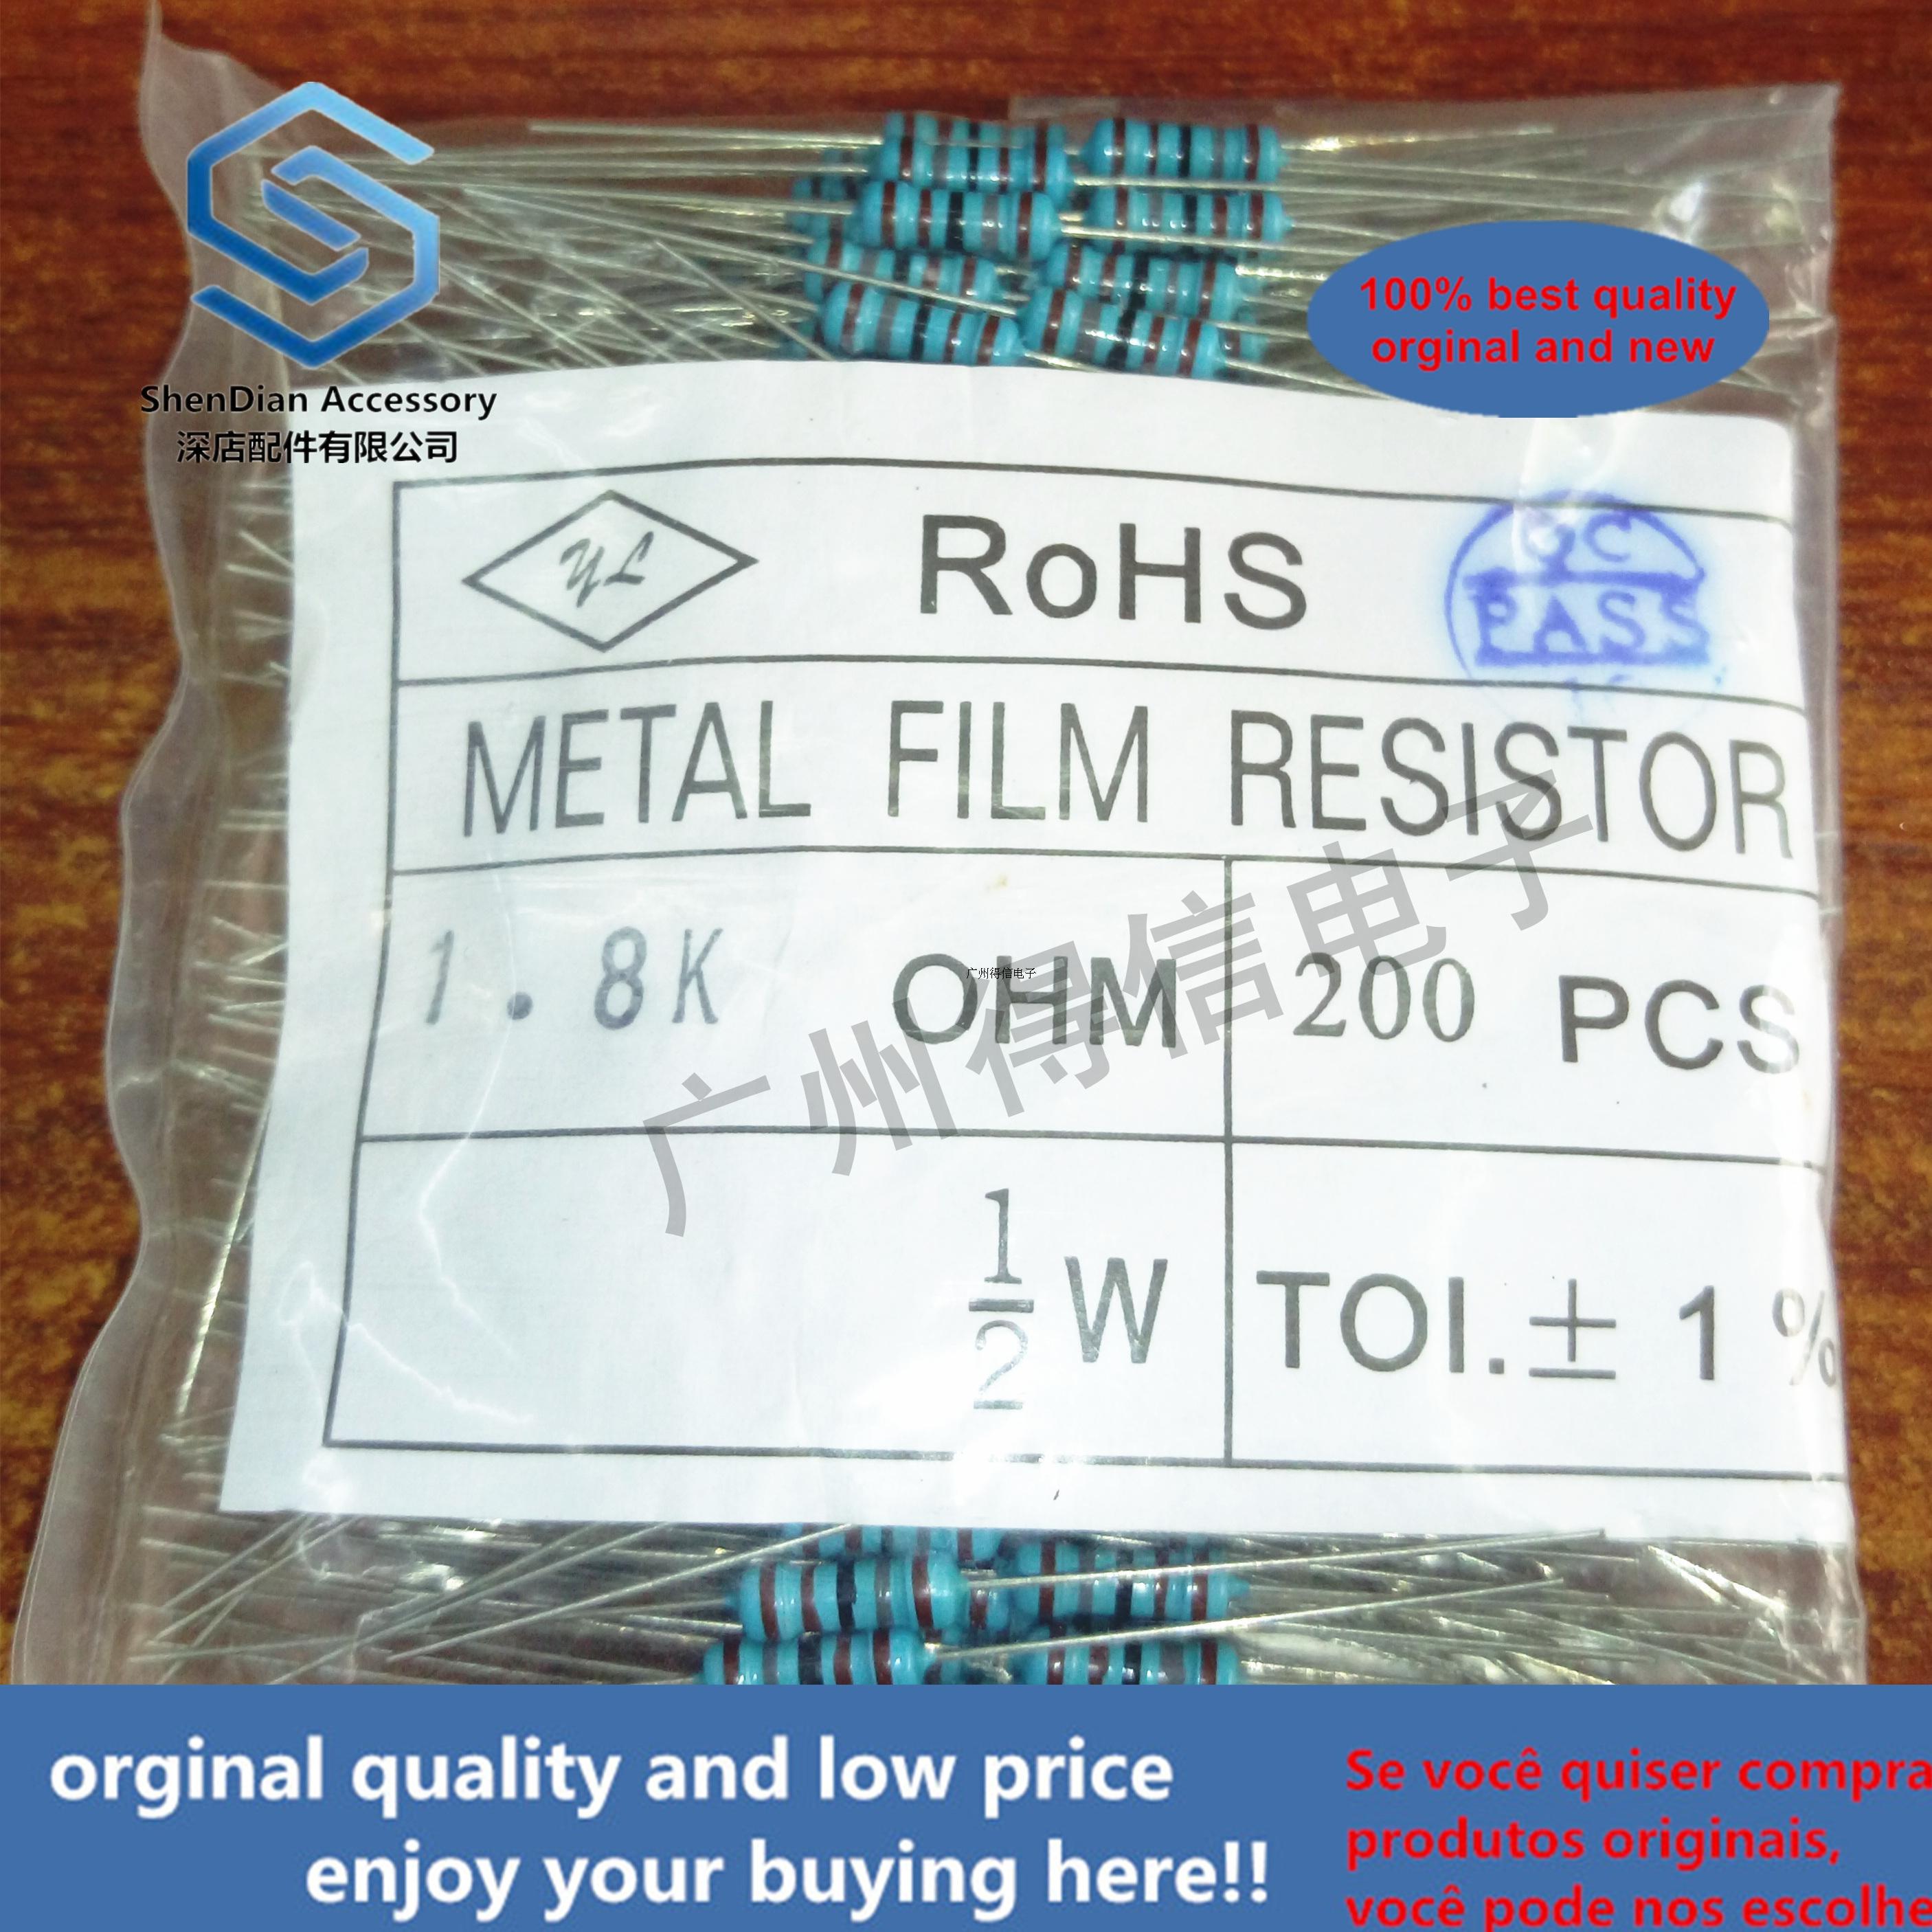 200pcs 1 / 2W 130K 1% Brand New Metal Film Iron Feet Resistor Bag 200 Pcs Per Pack